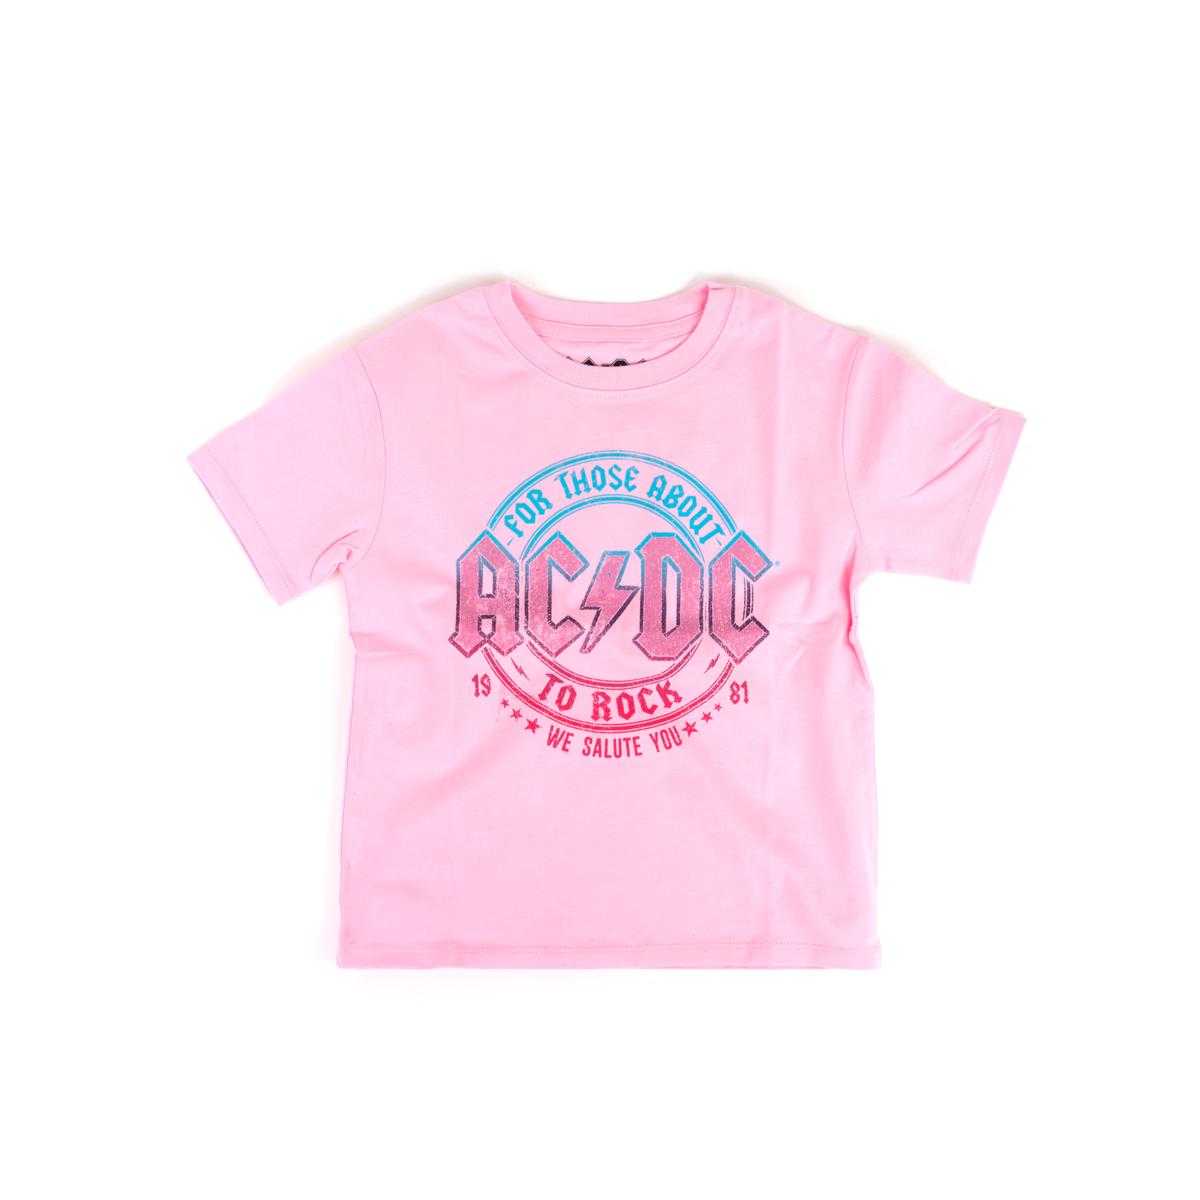 Kids Pink We Salute You T-shirt